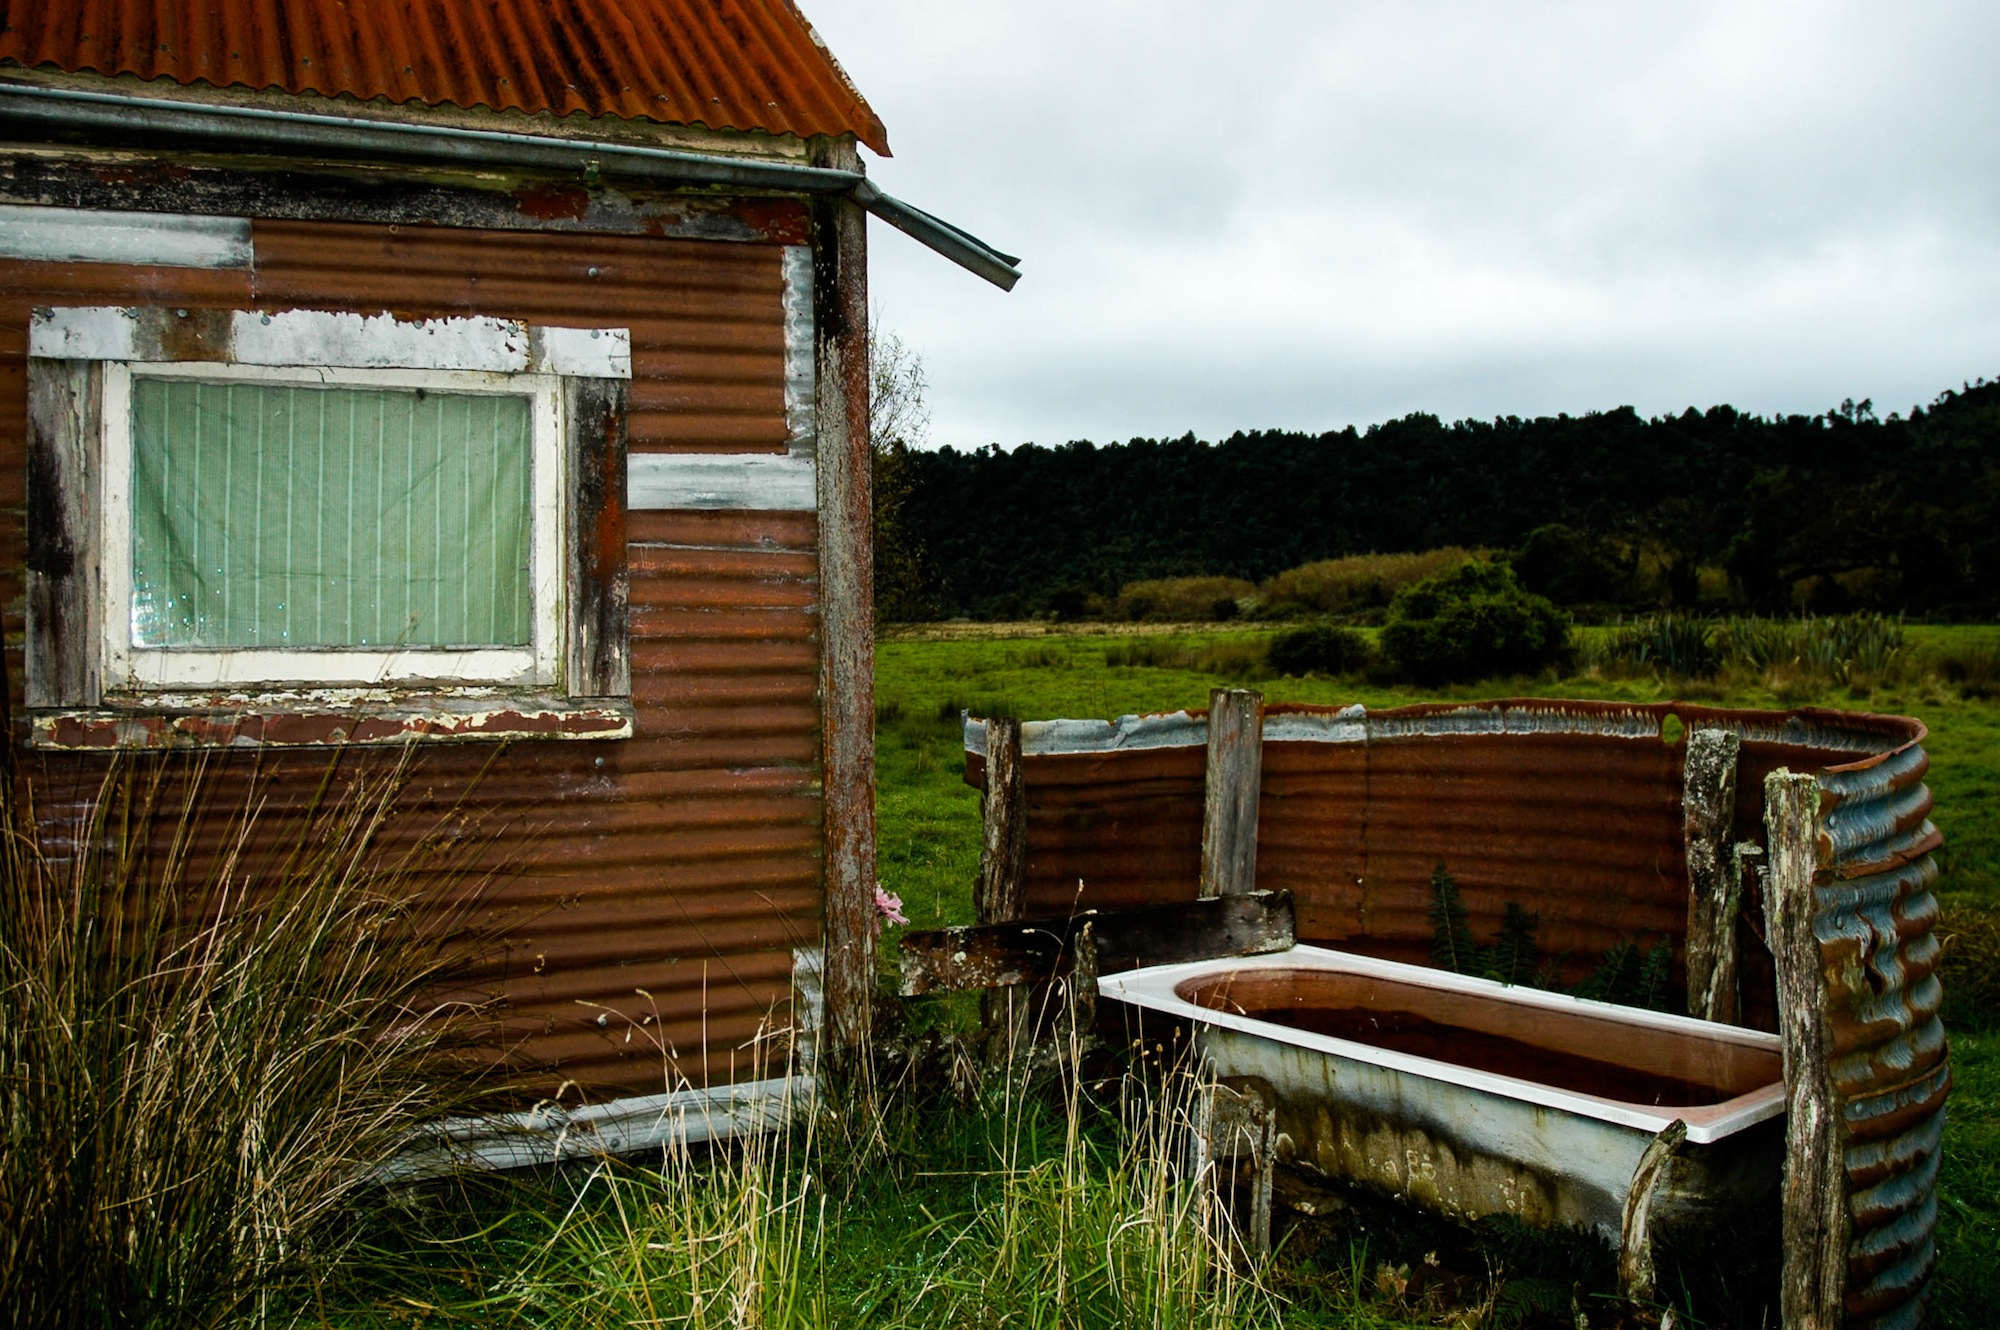 abandoned_house_new zealand_ben_howe_15.jpg